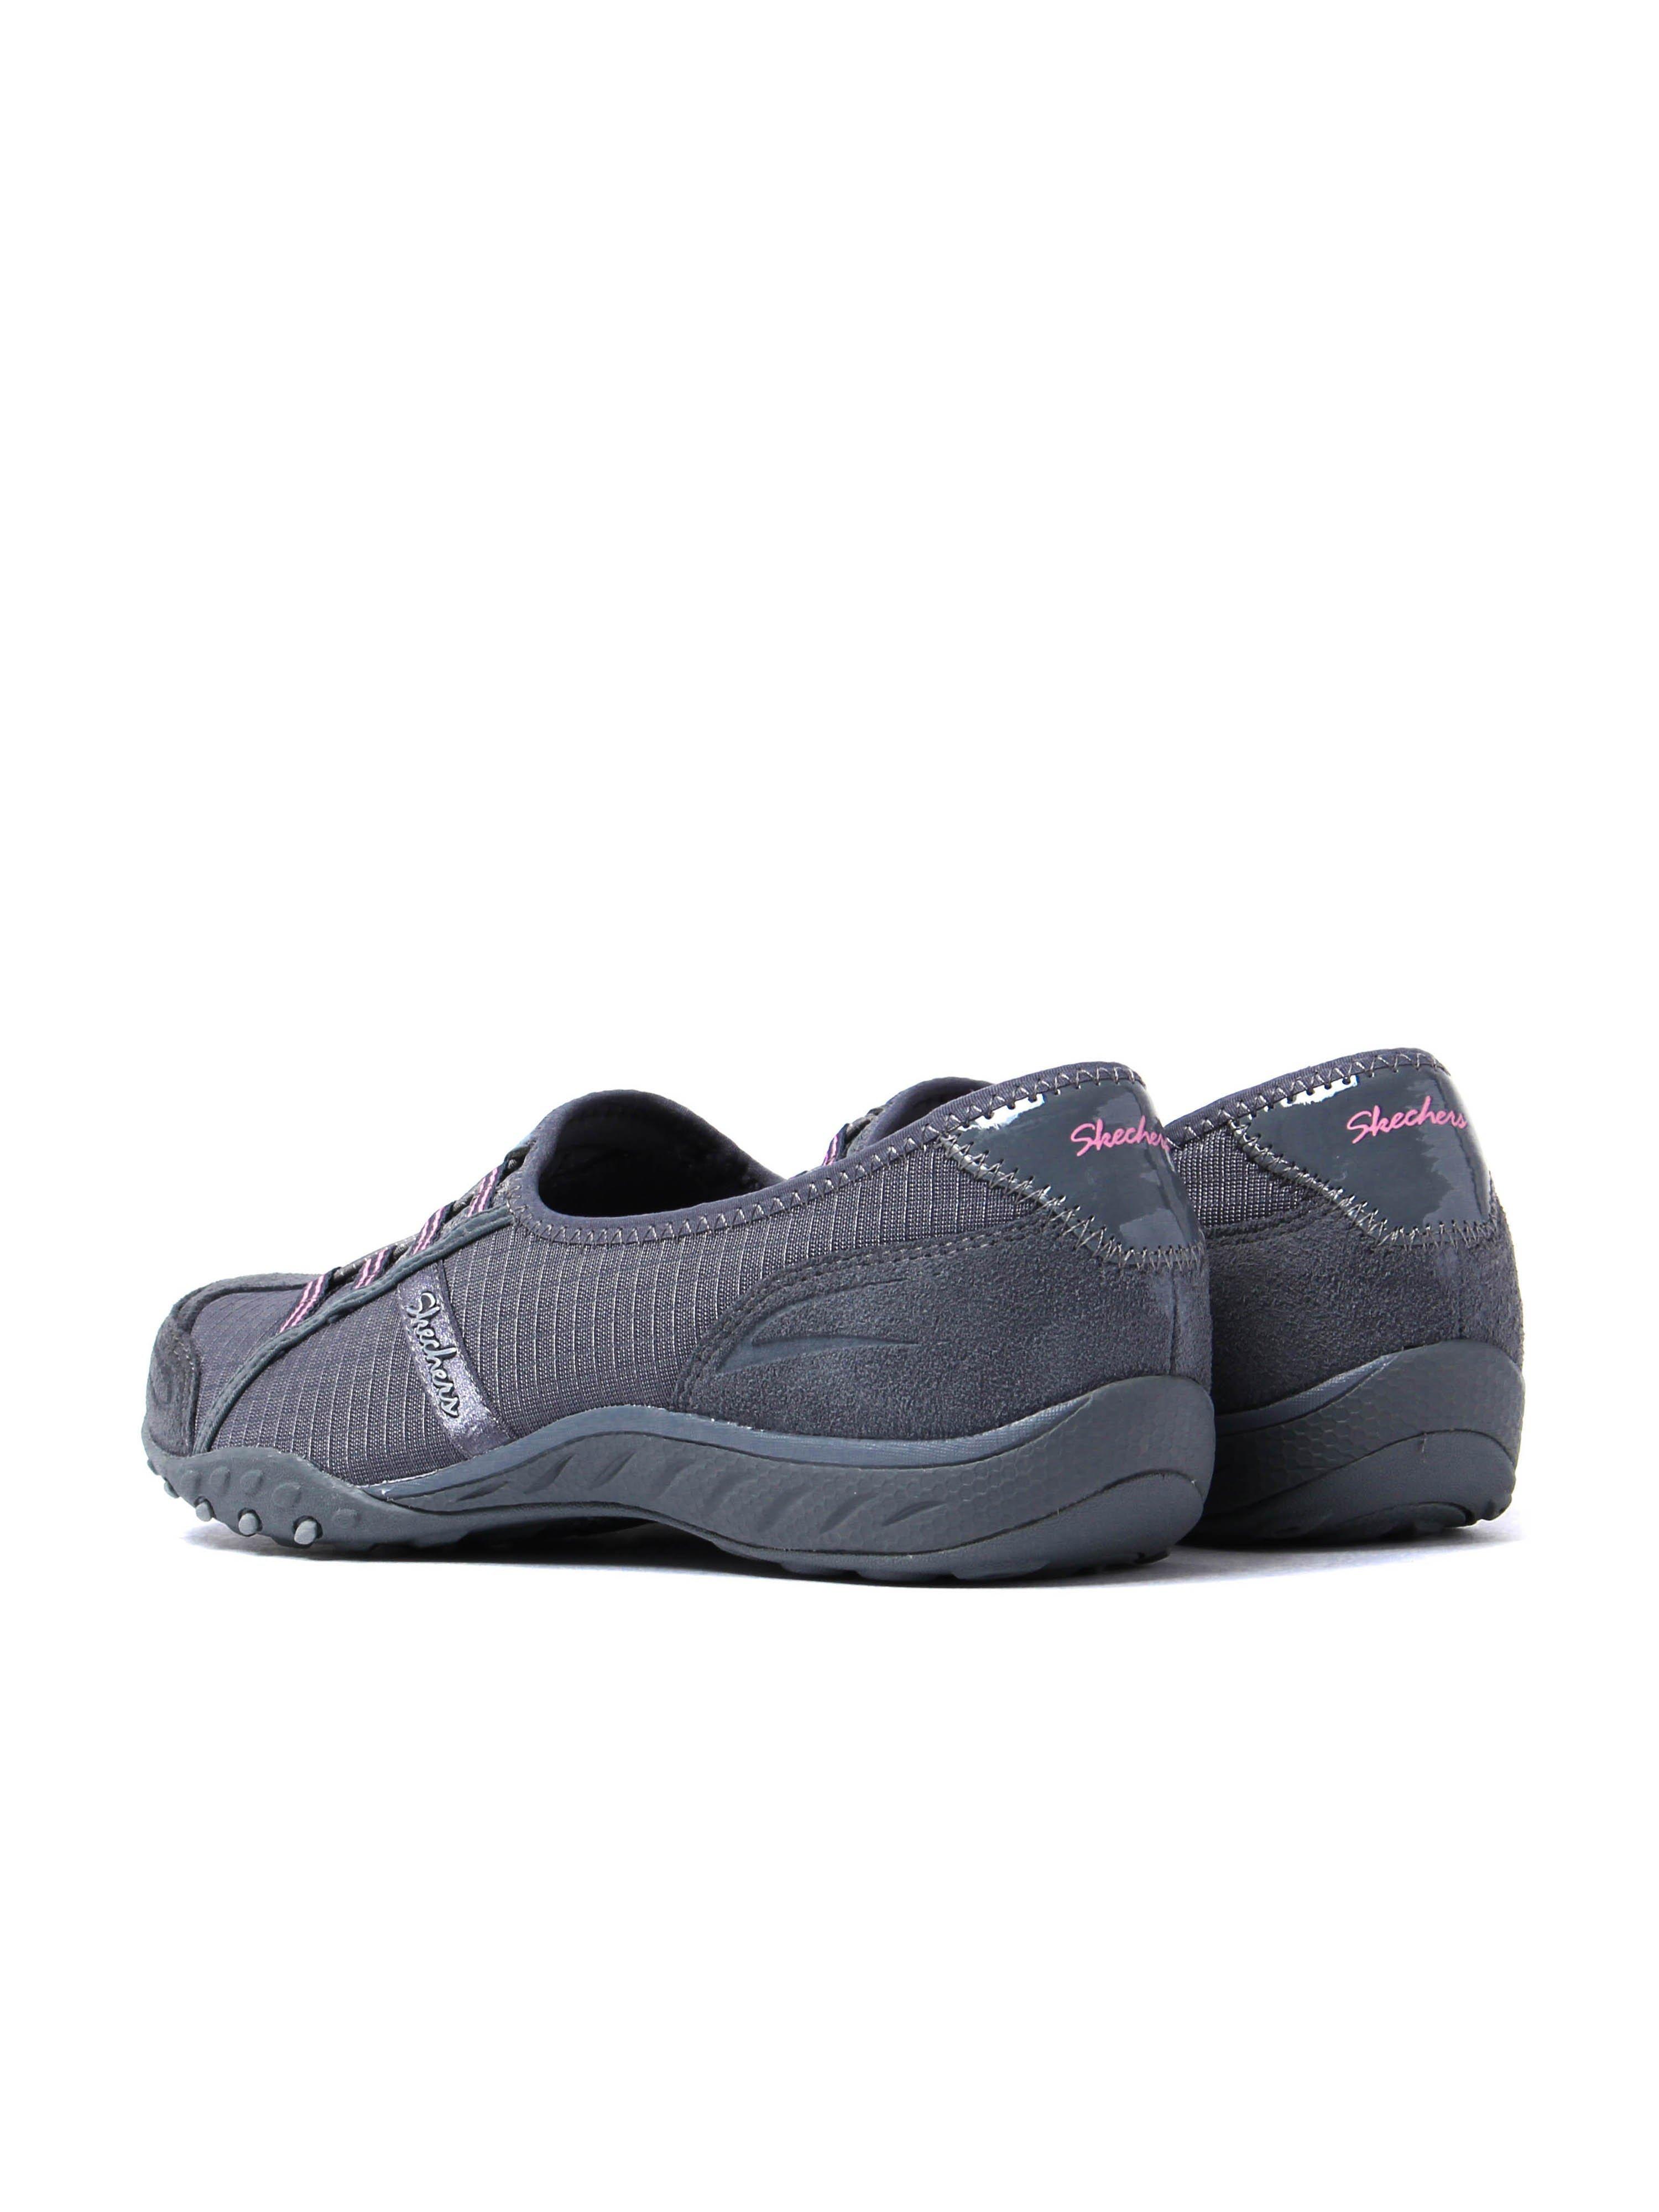 Skechers Women's Breathe Easy Allure Trainers - Charcoal